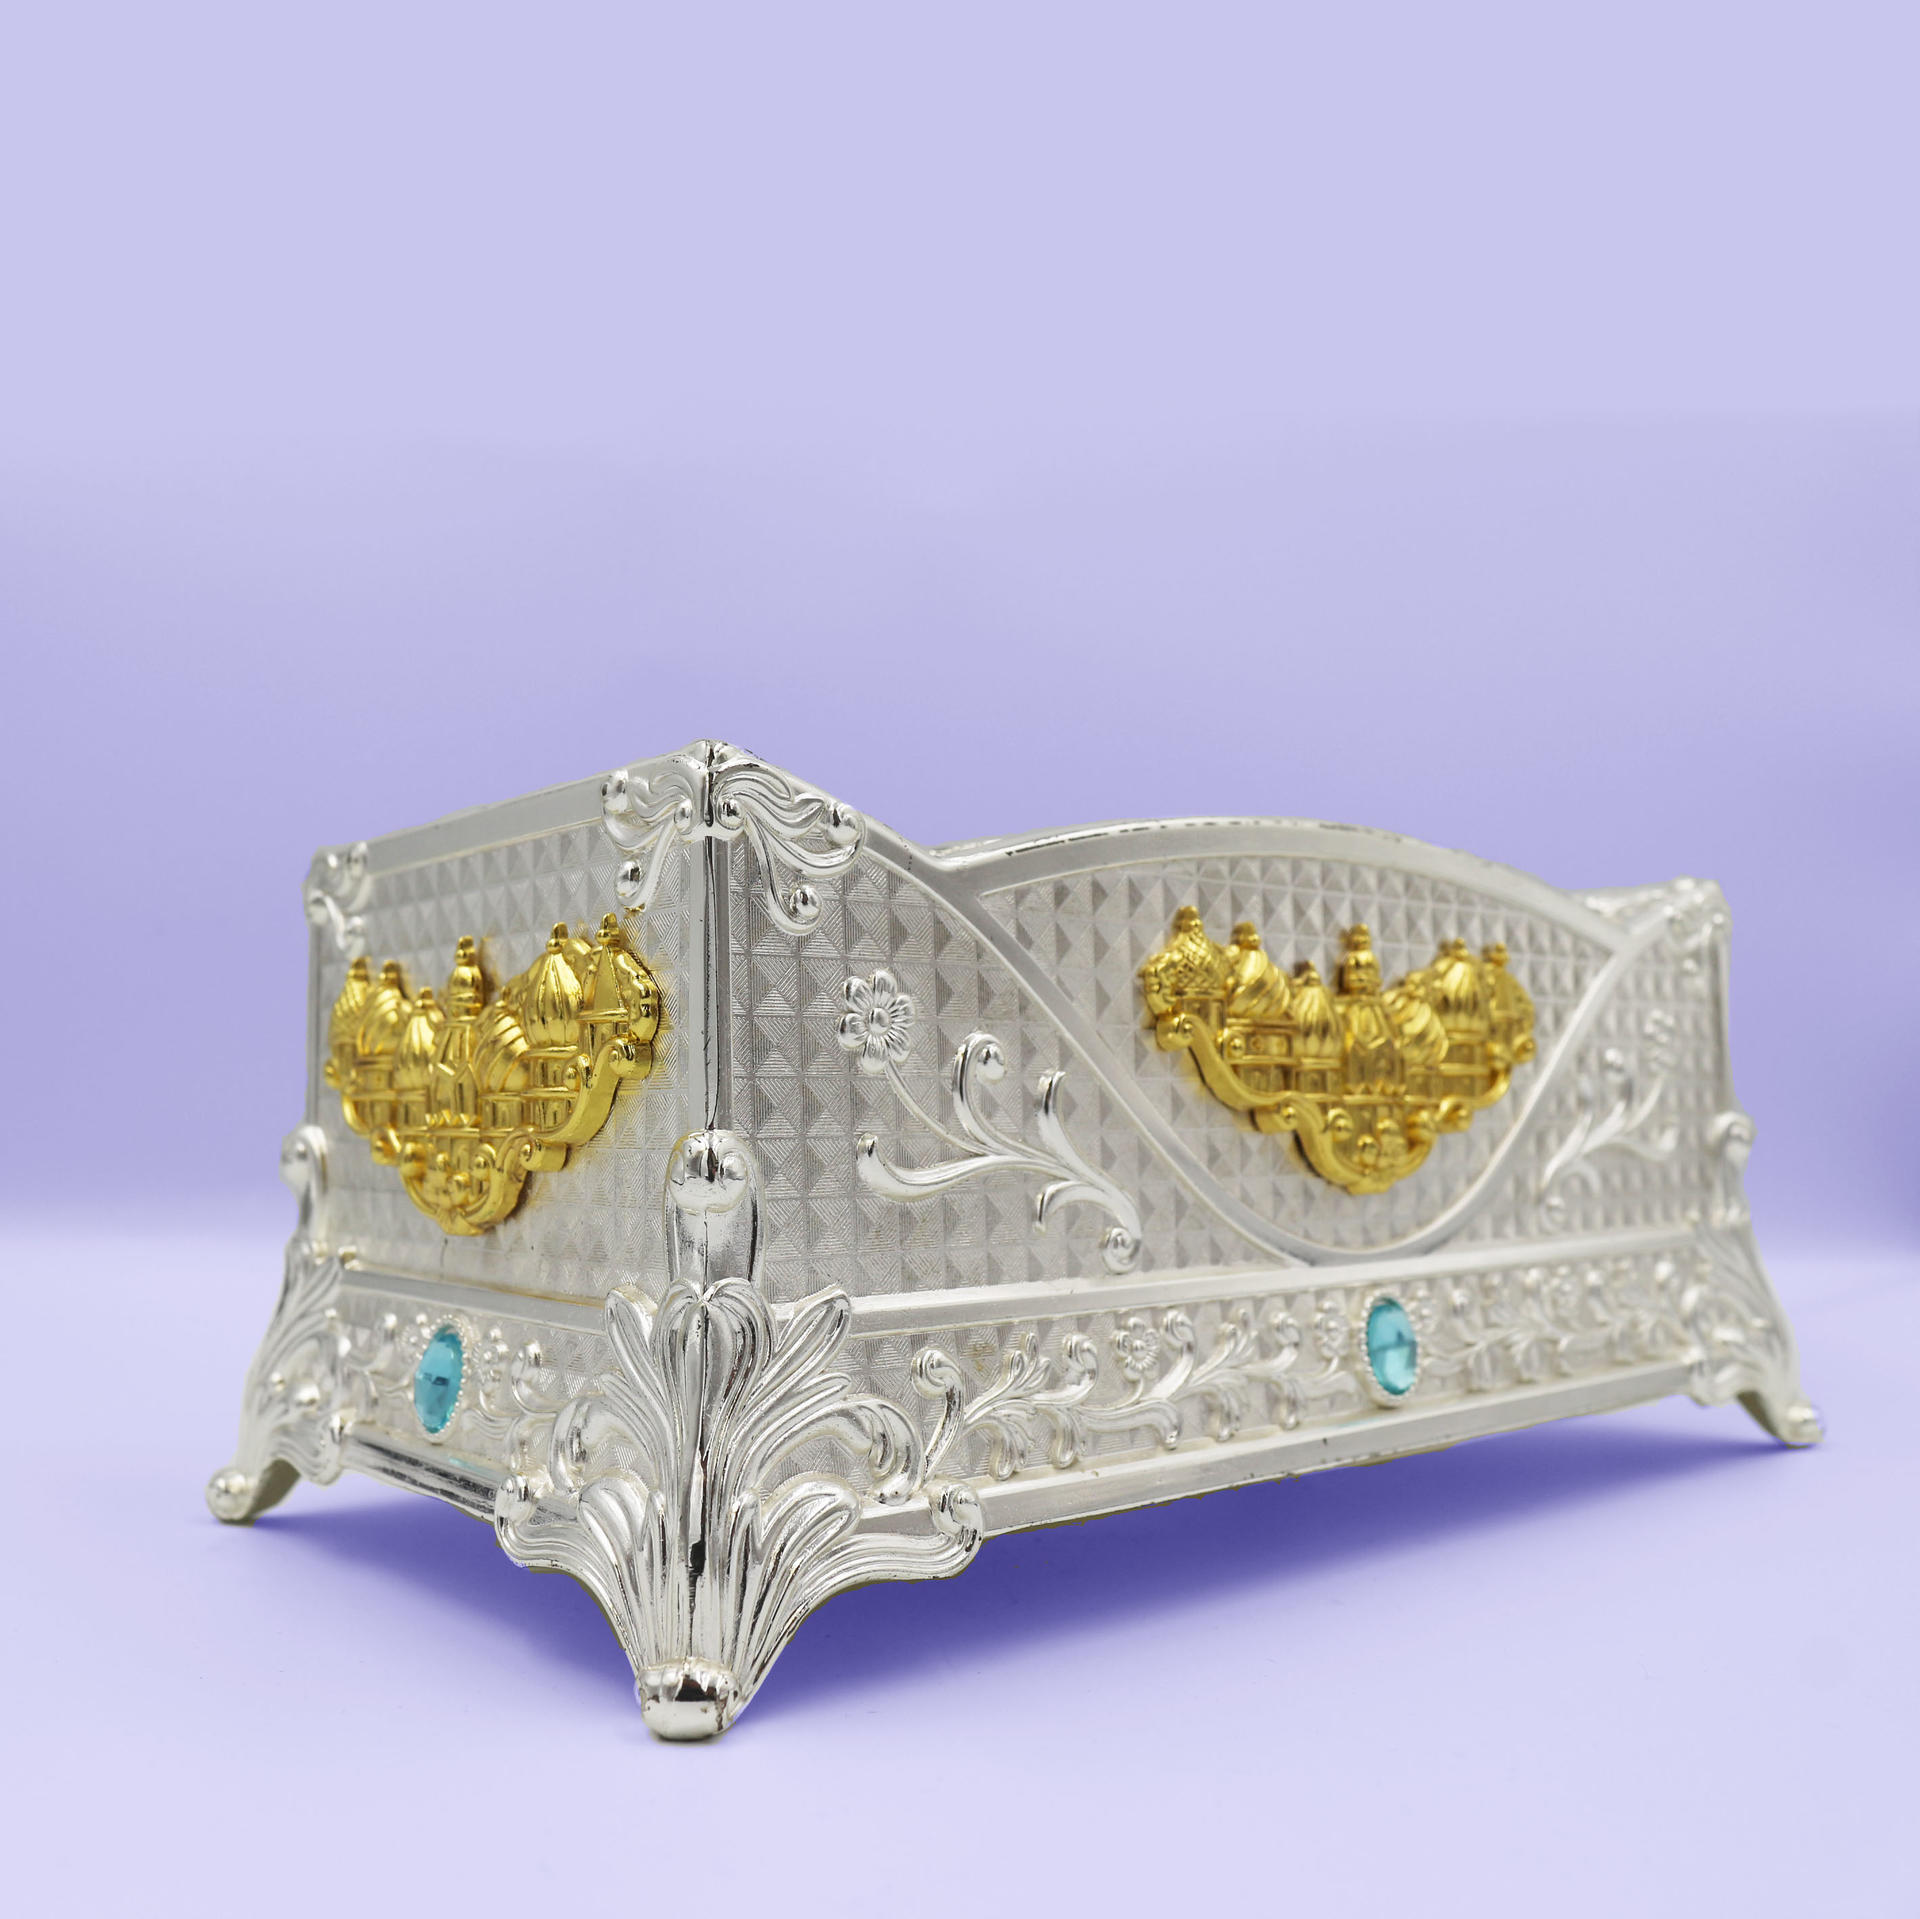 European retro high-end luxury art tissue box